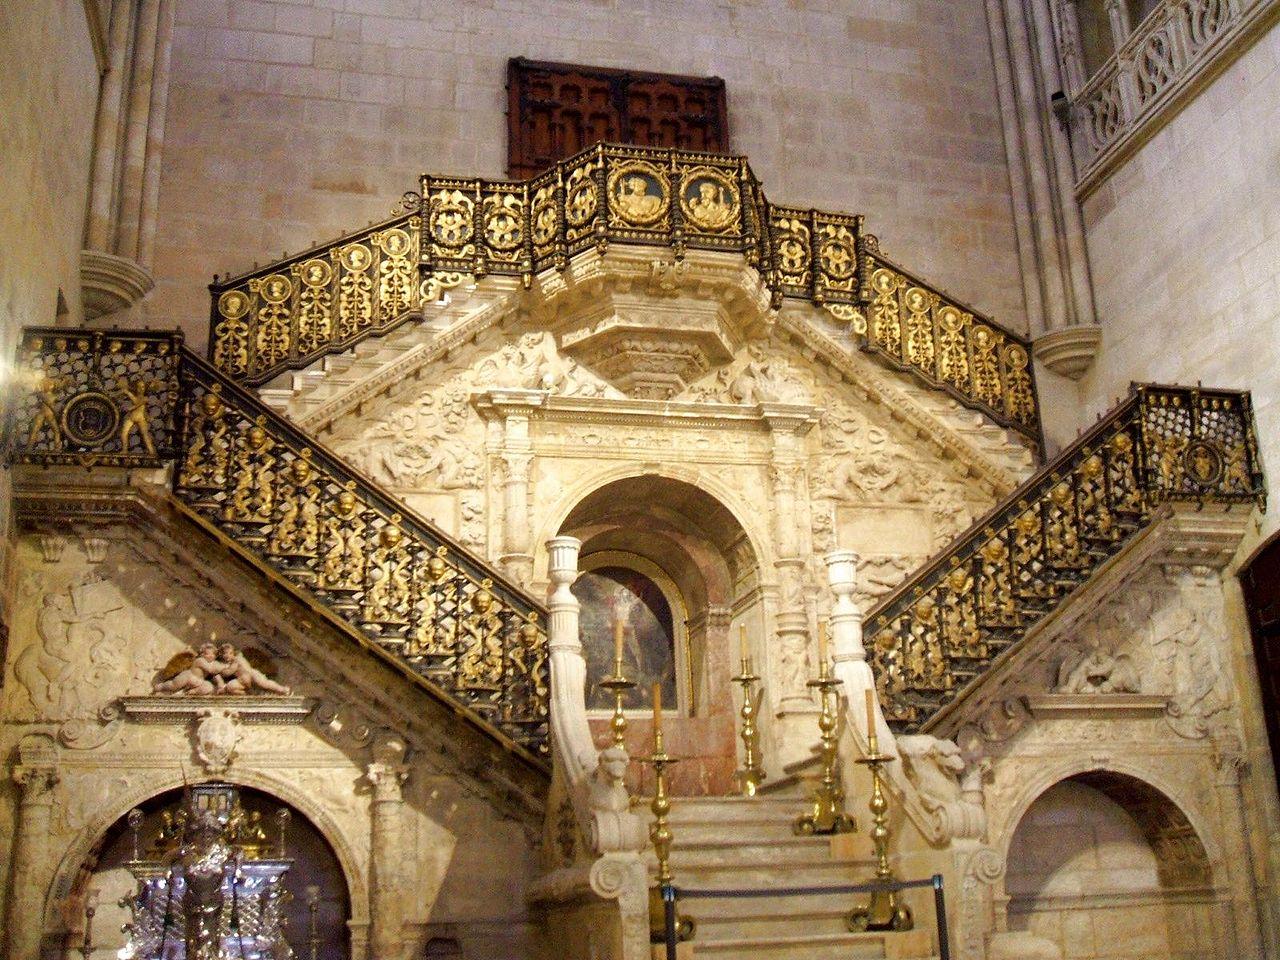 Escalera dorada de la catedral de Burgos, de Diego de Siloé